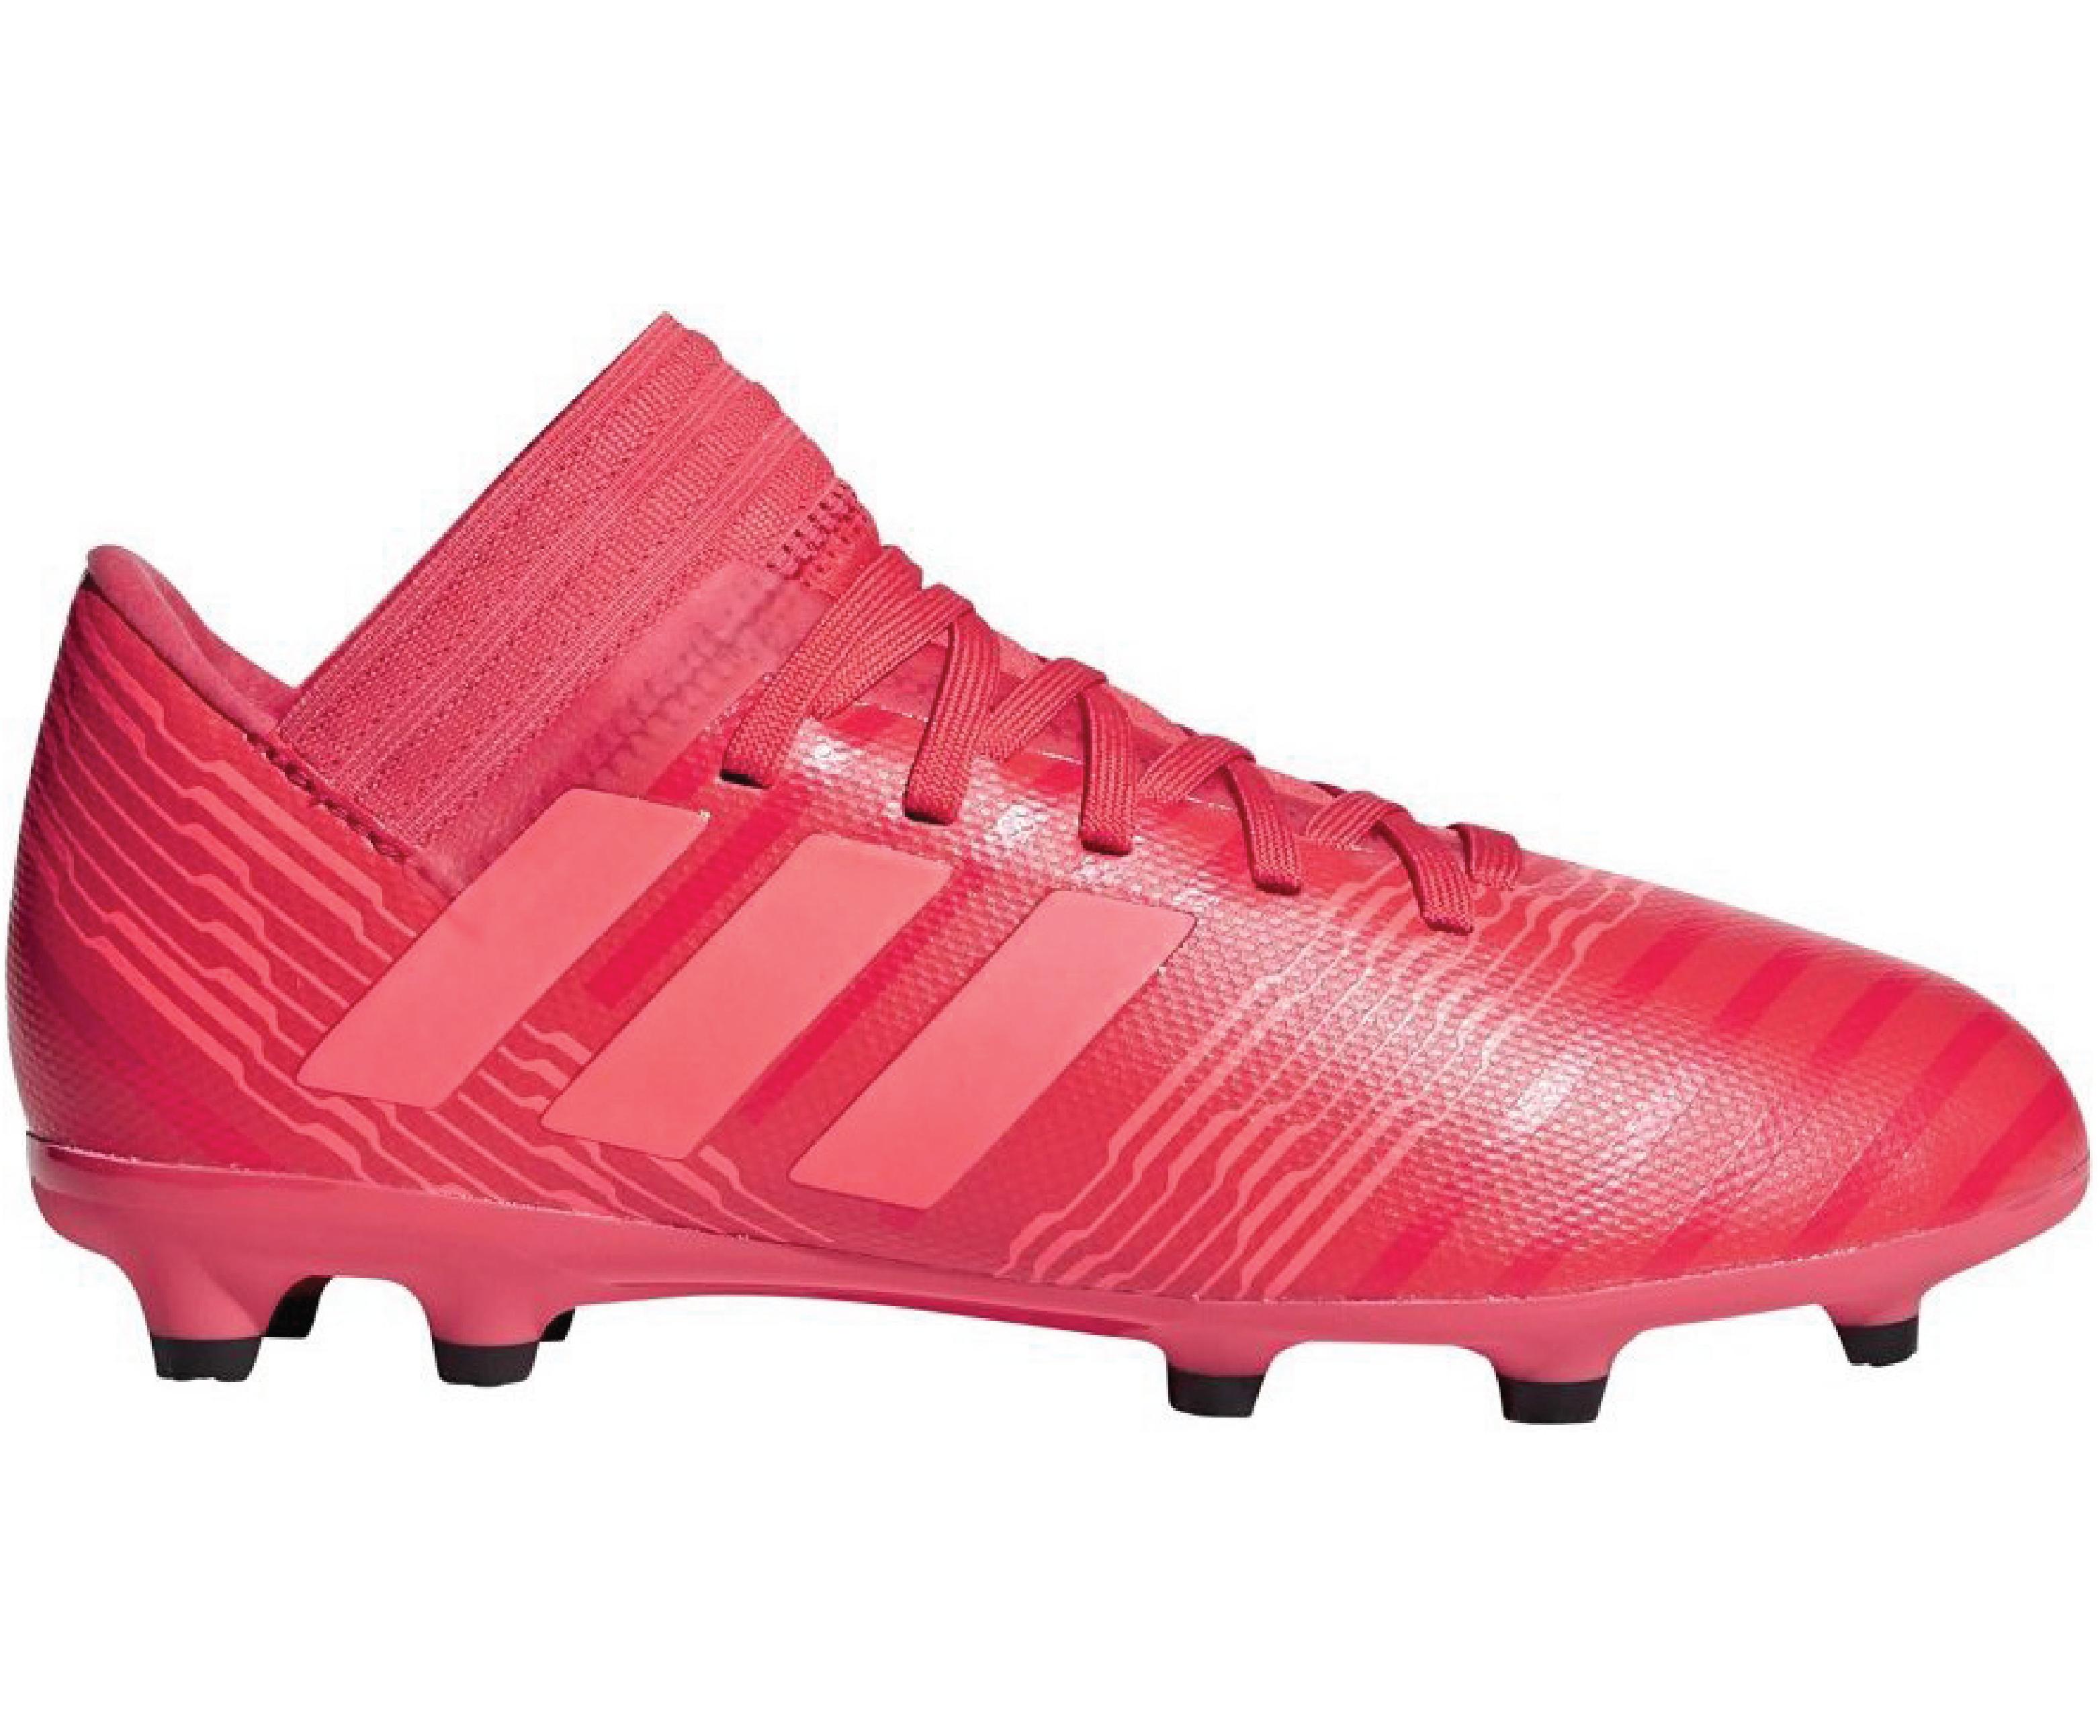 A Picture Of Adidas Performance Kids Nemeziz 17 3 Fg Adidas Soccer Cleats Soccer Cleats Adidas Football Boots Soccer Cleats